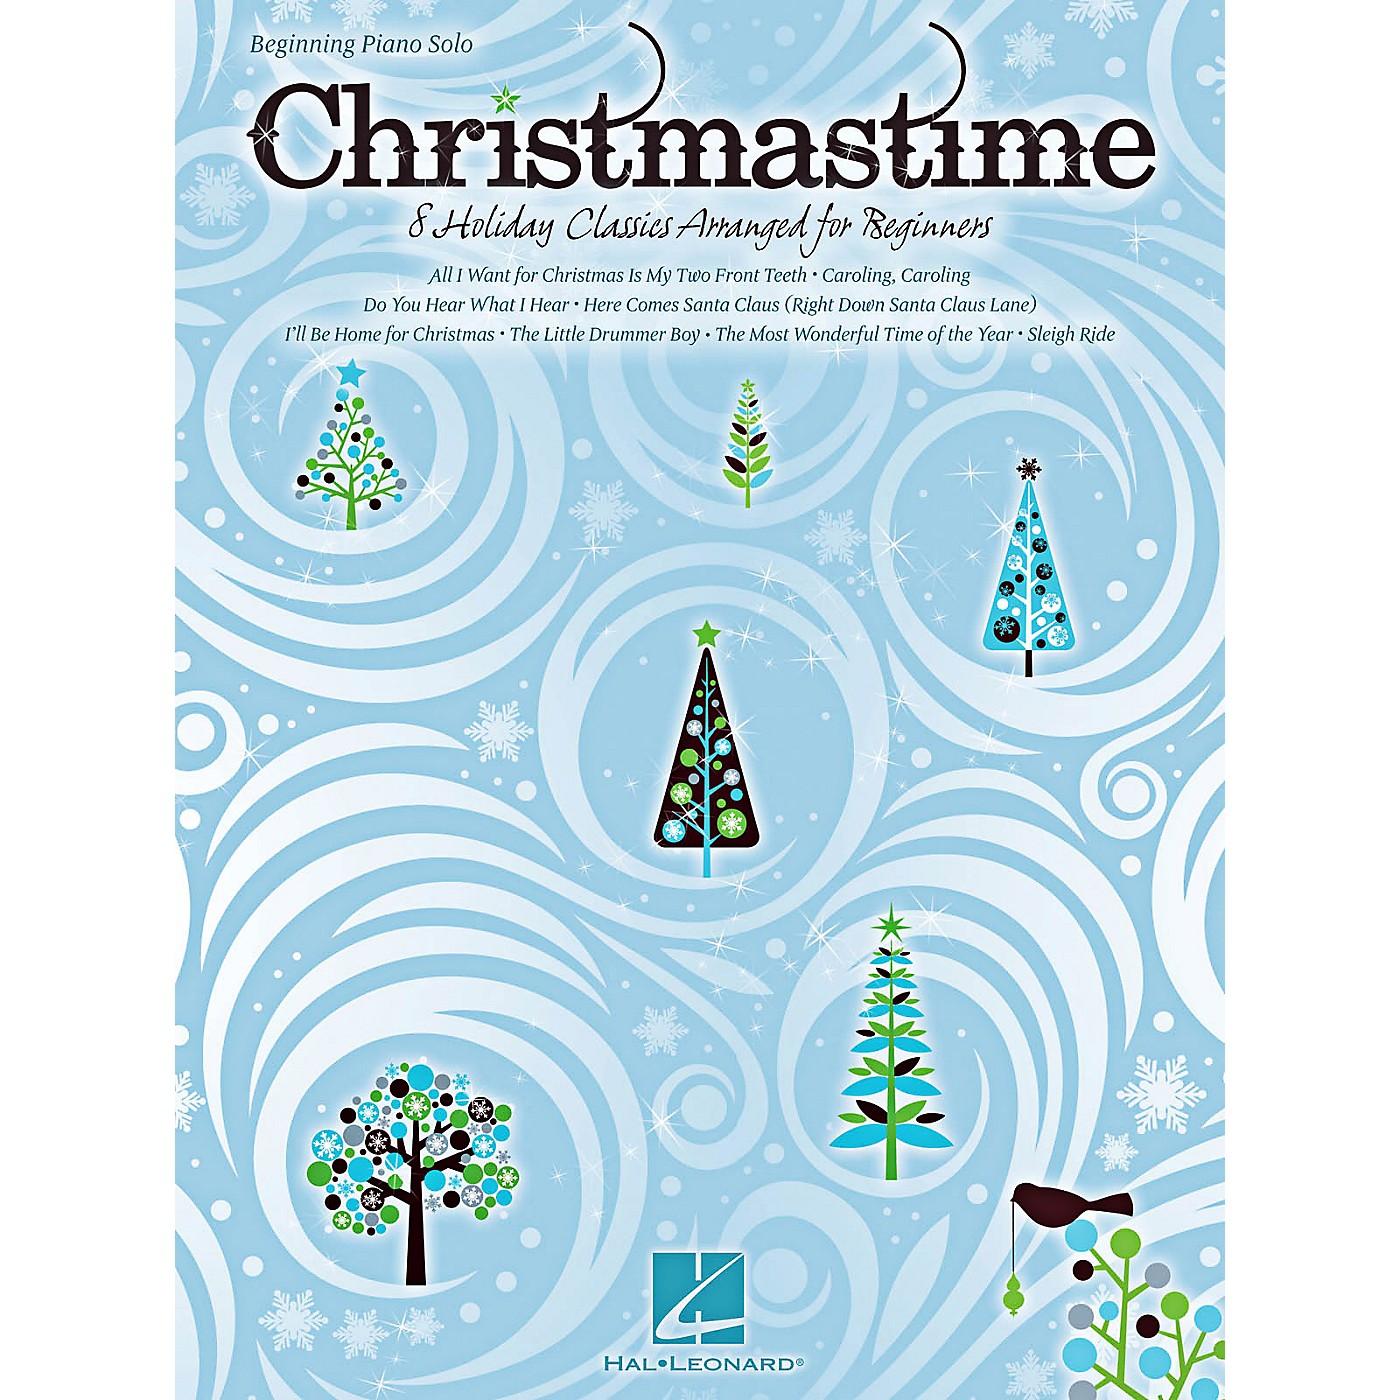 Hal Leonard Christmastime - Beginning Piano Solo Songbook thumbnail